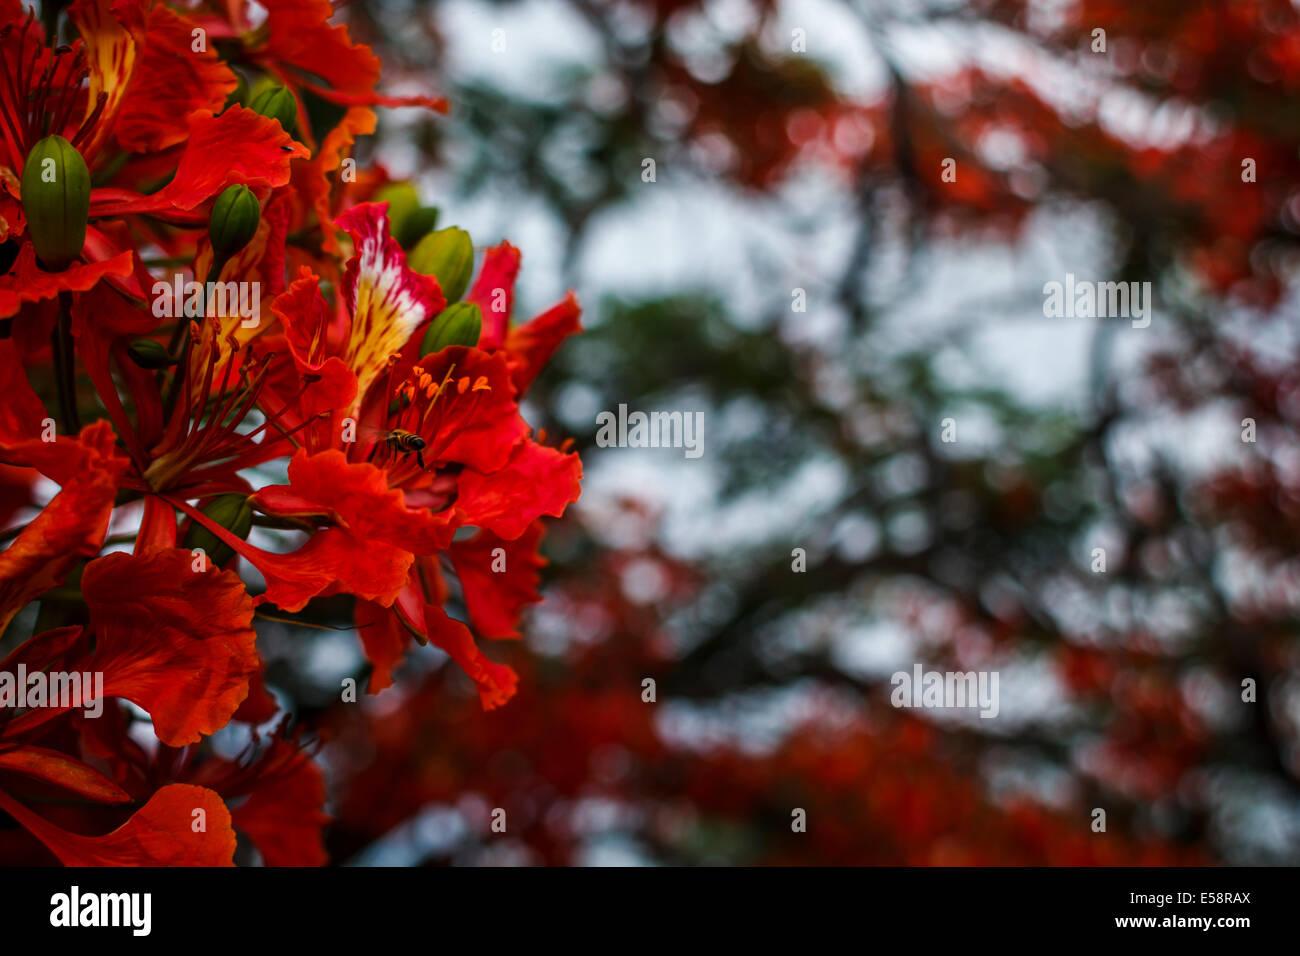 Flamboyant flowers - Stock Image